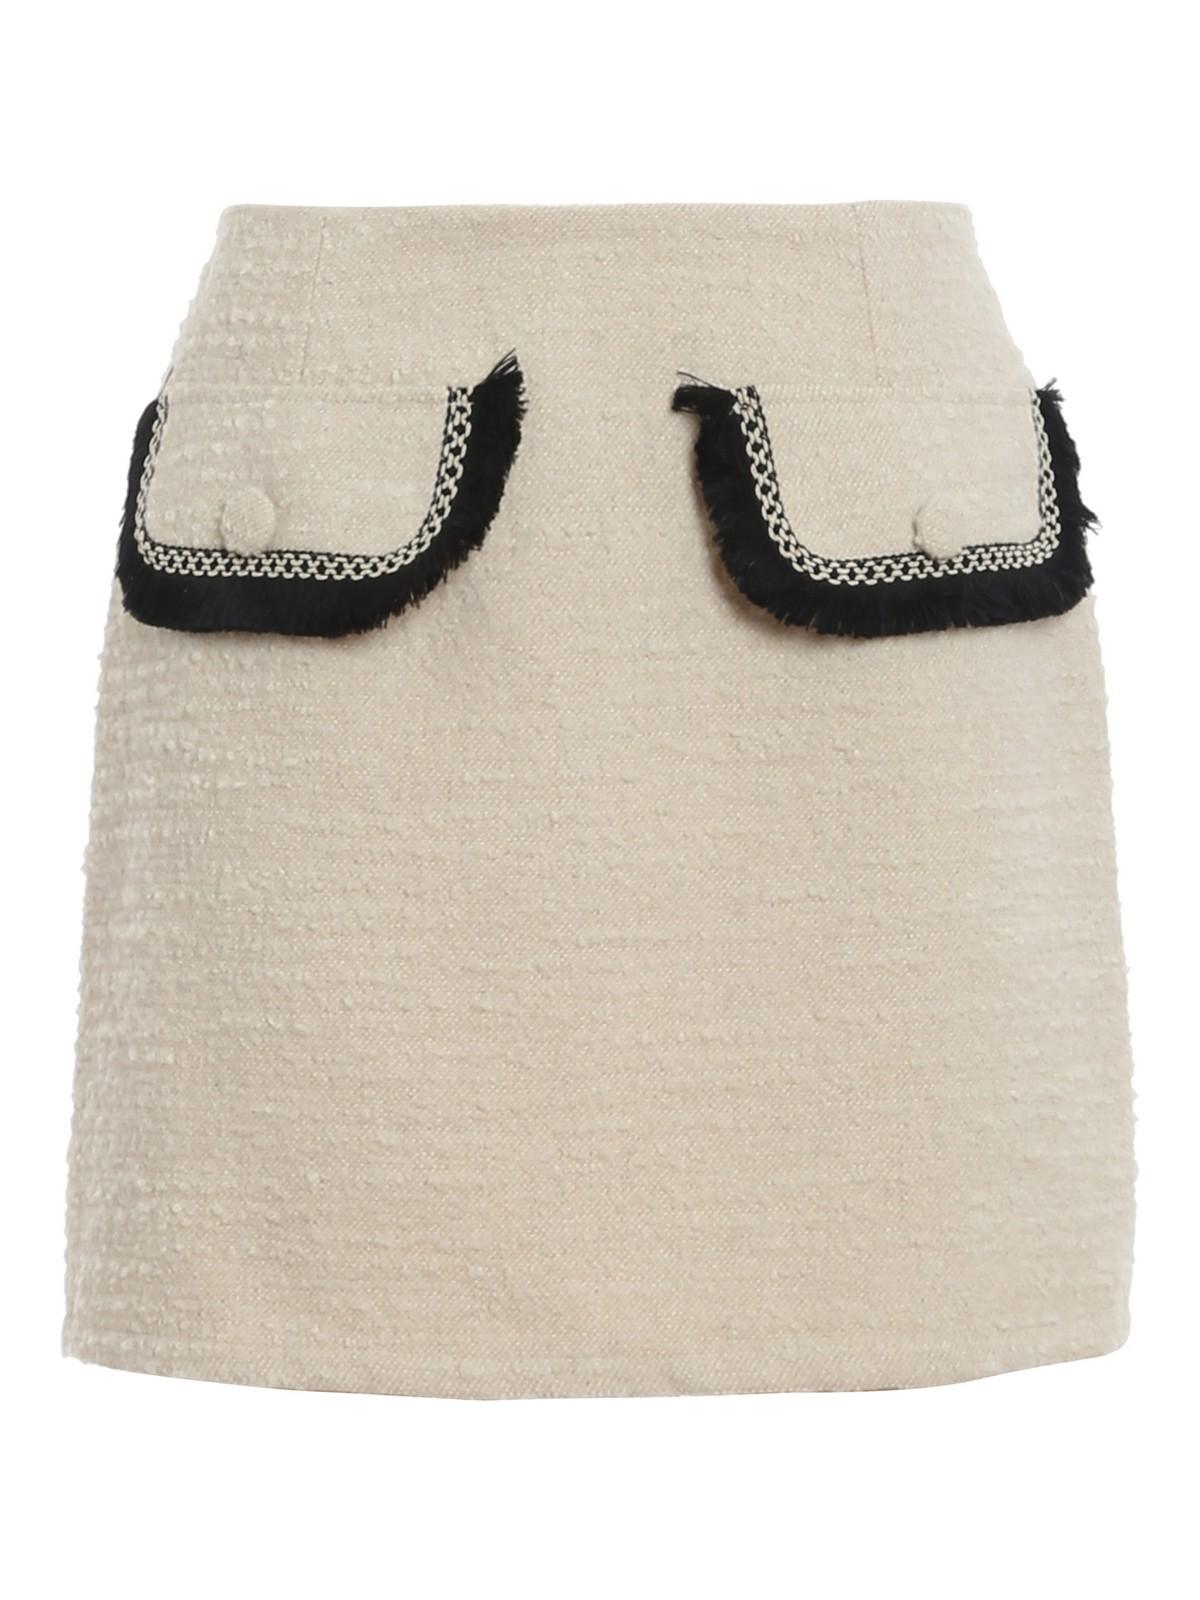 Be Blumarine Bouclé Wool Blend Mini Skirt In Cream Colour